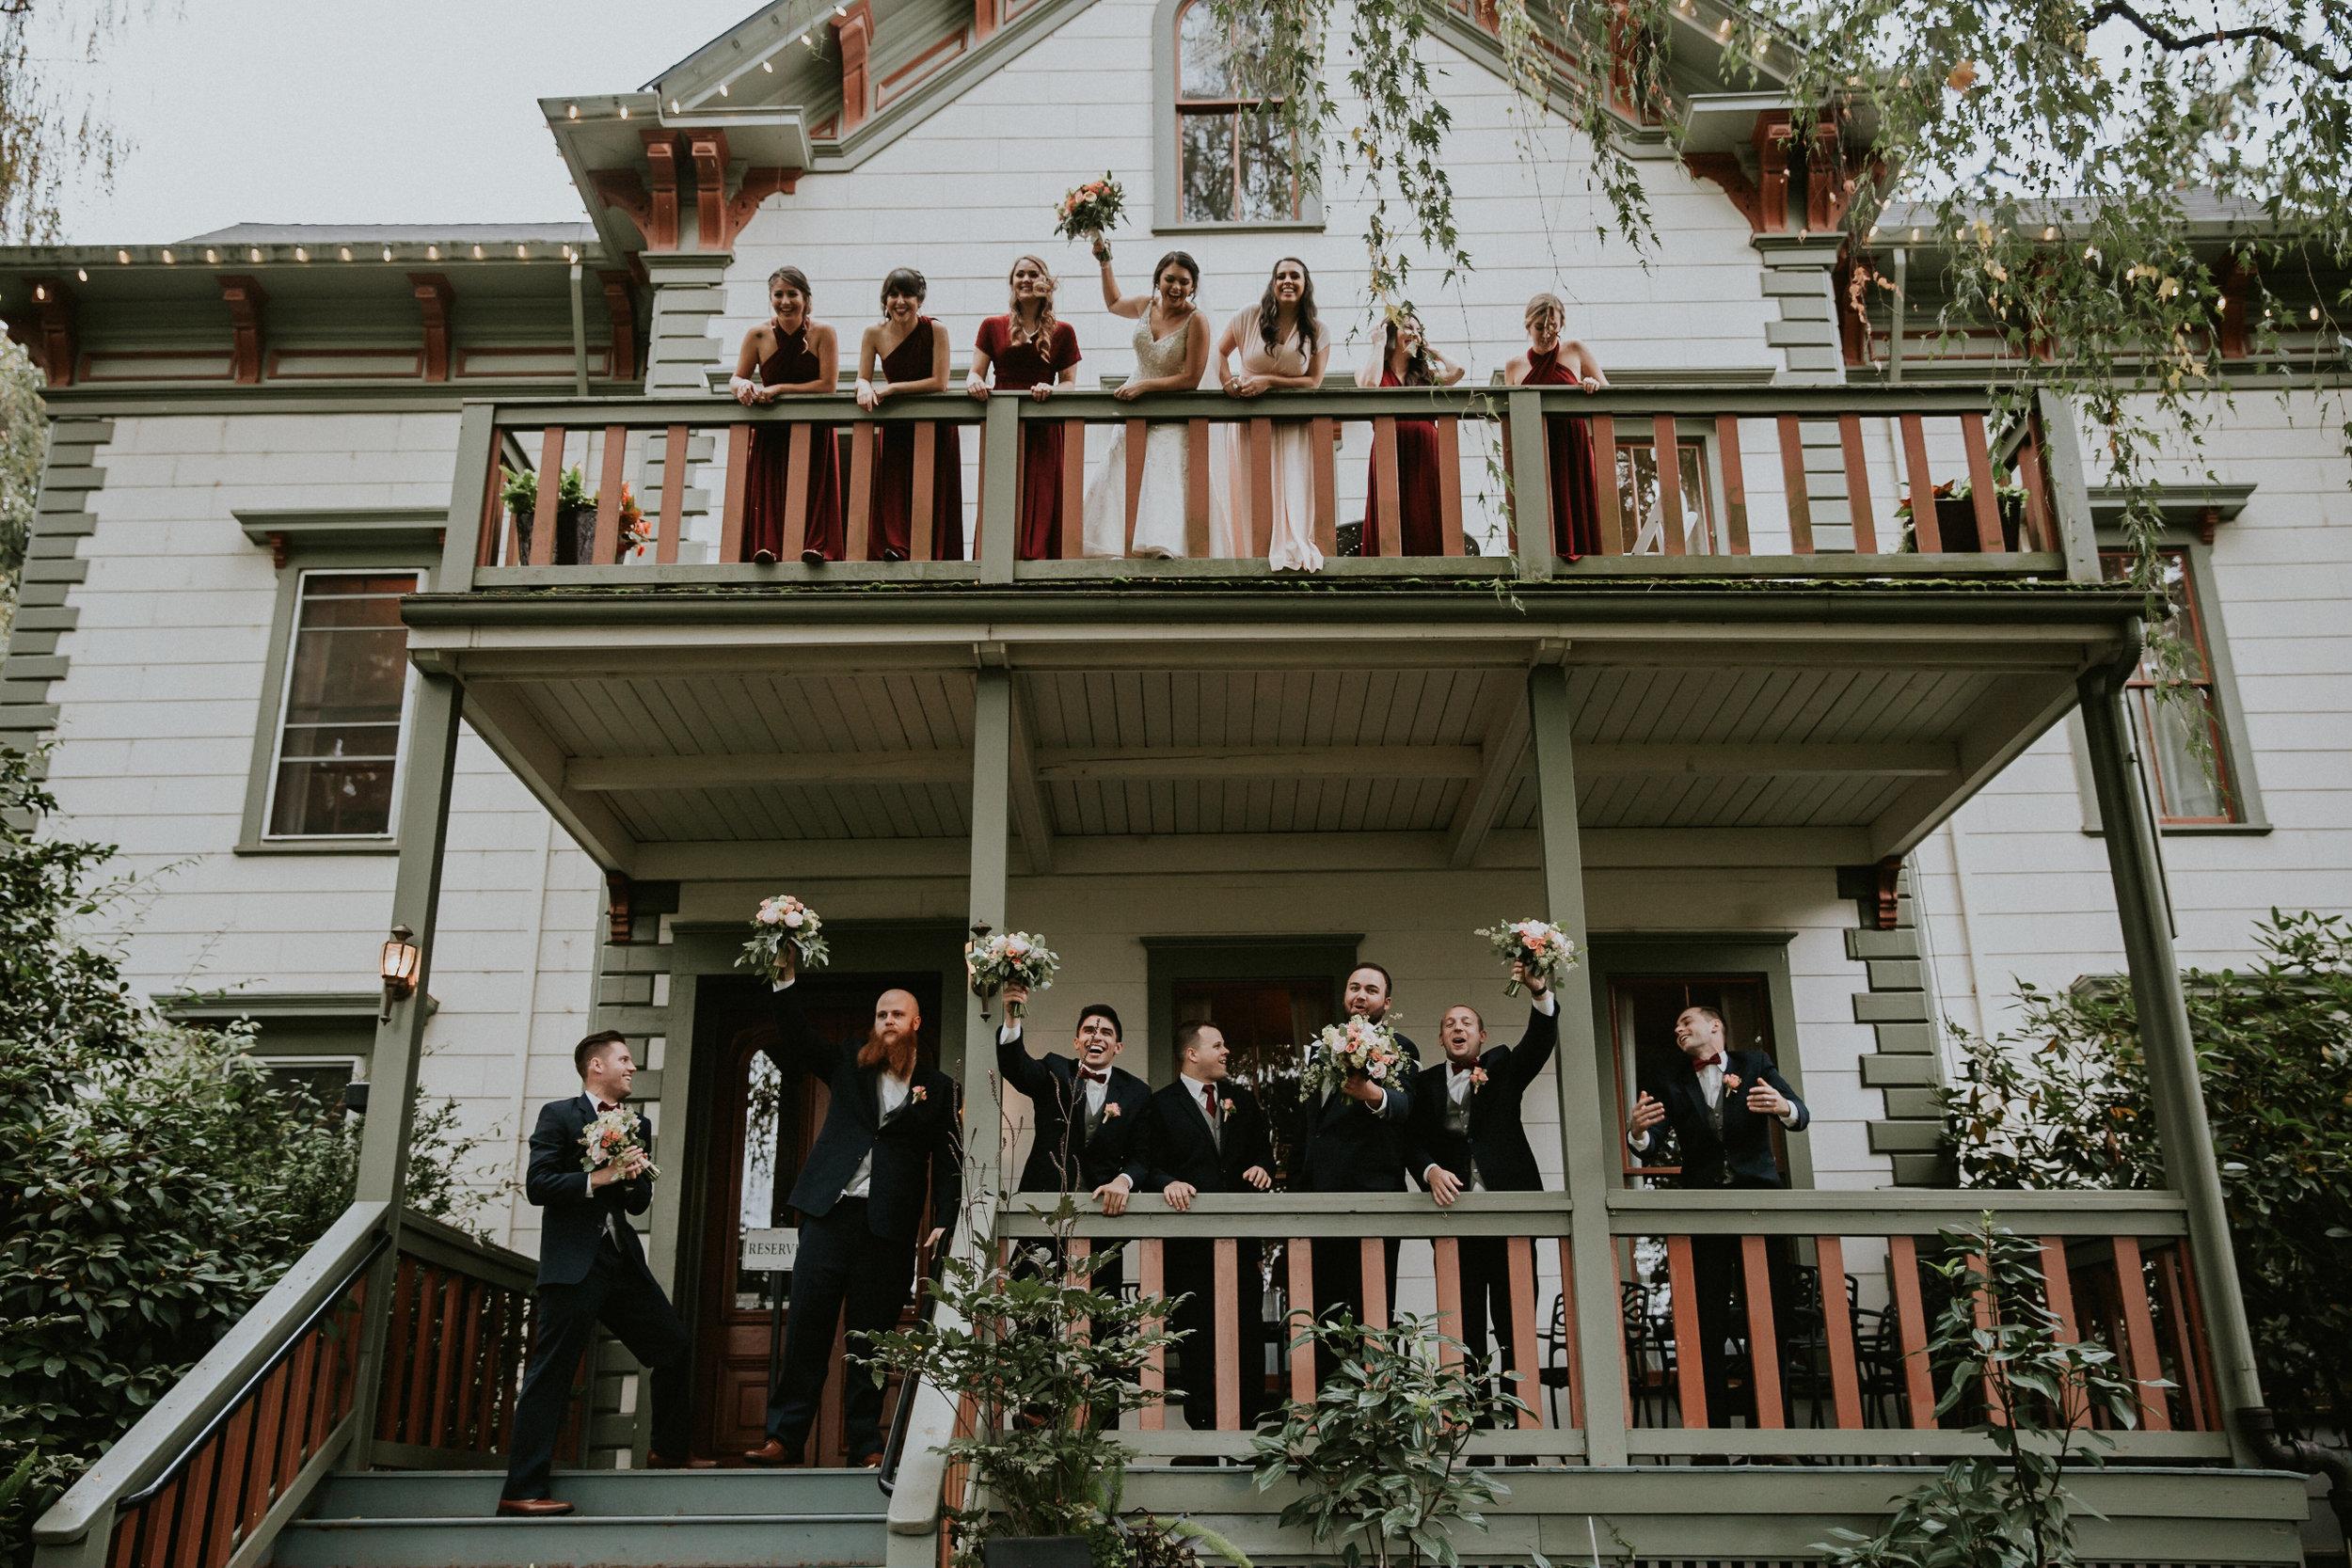 McMenamins_Cornelious_Pass_Roadhouse_wedding_photographer_AlfredTang-11.jpg